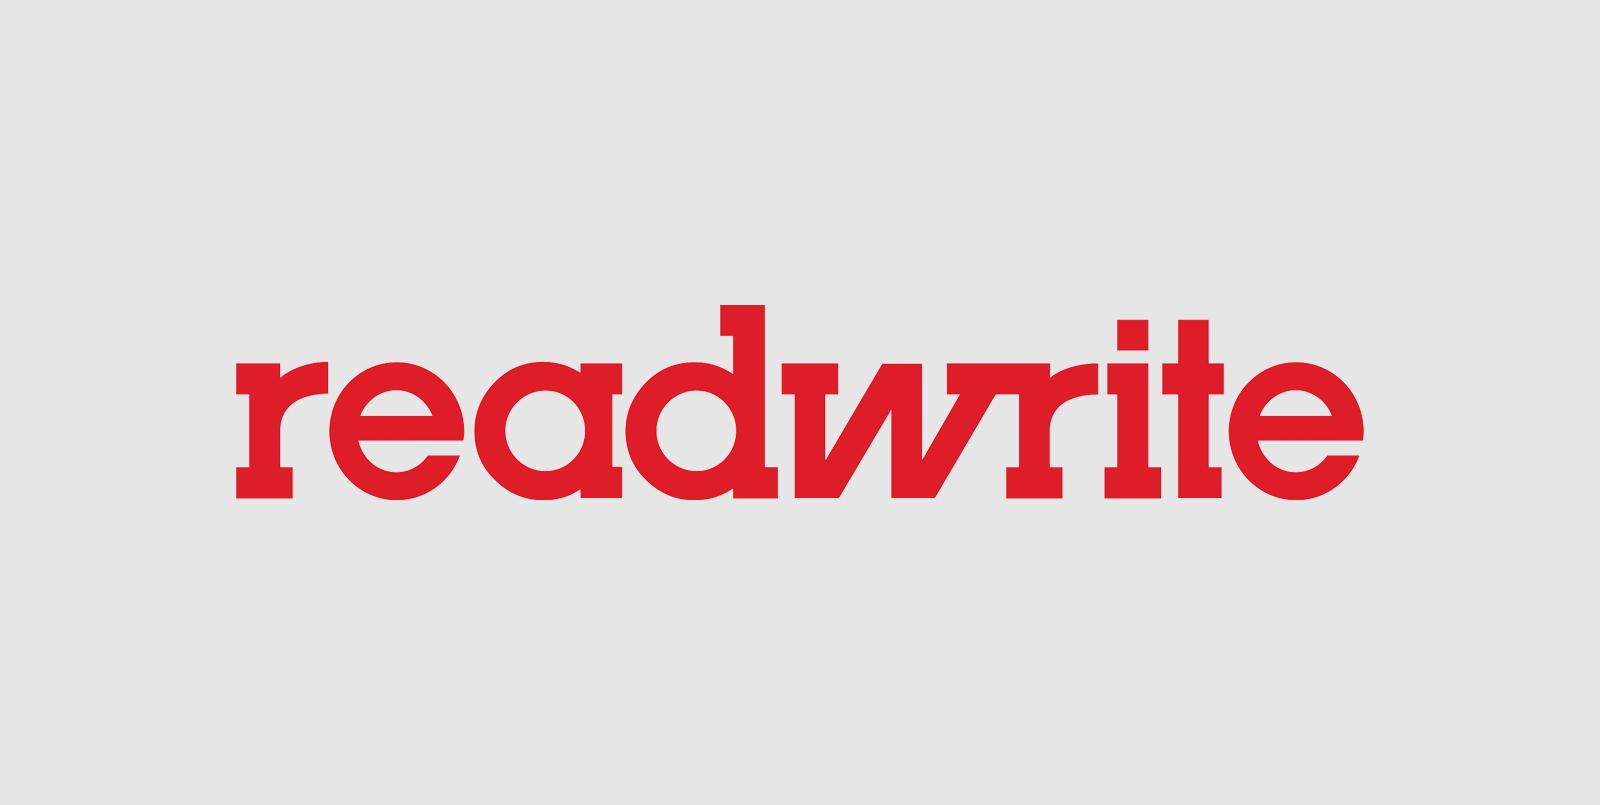 cloudify readwrite cloud optimization